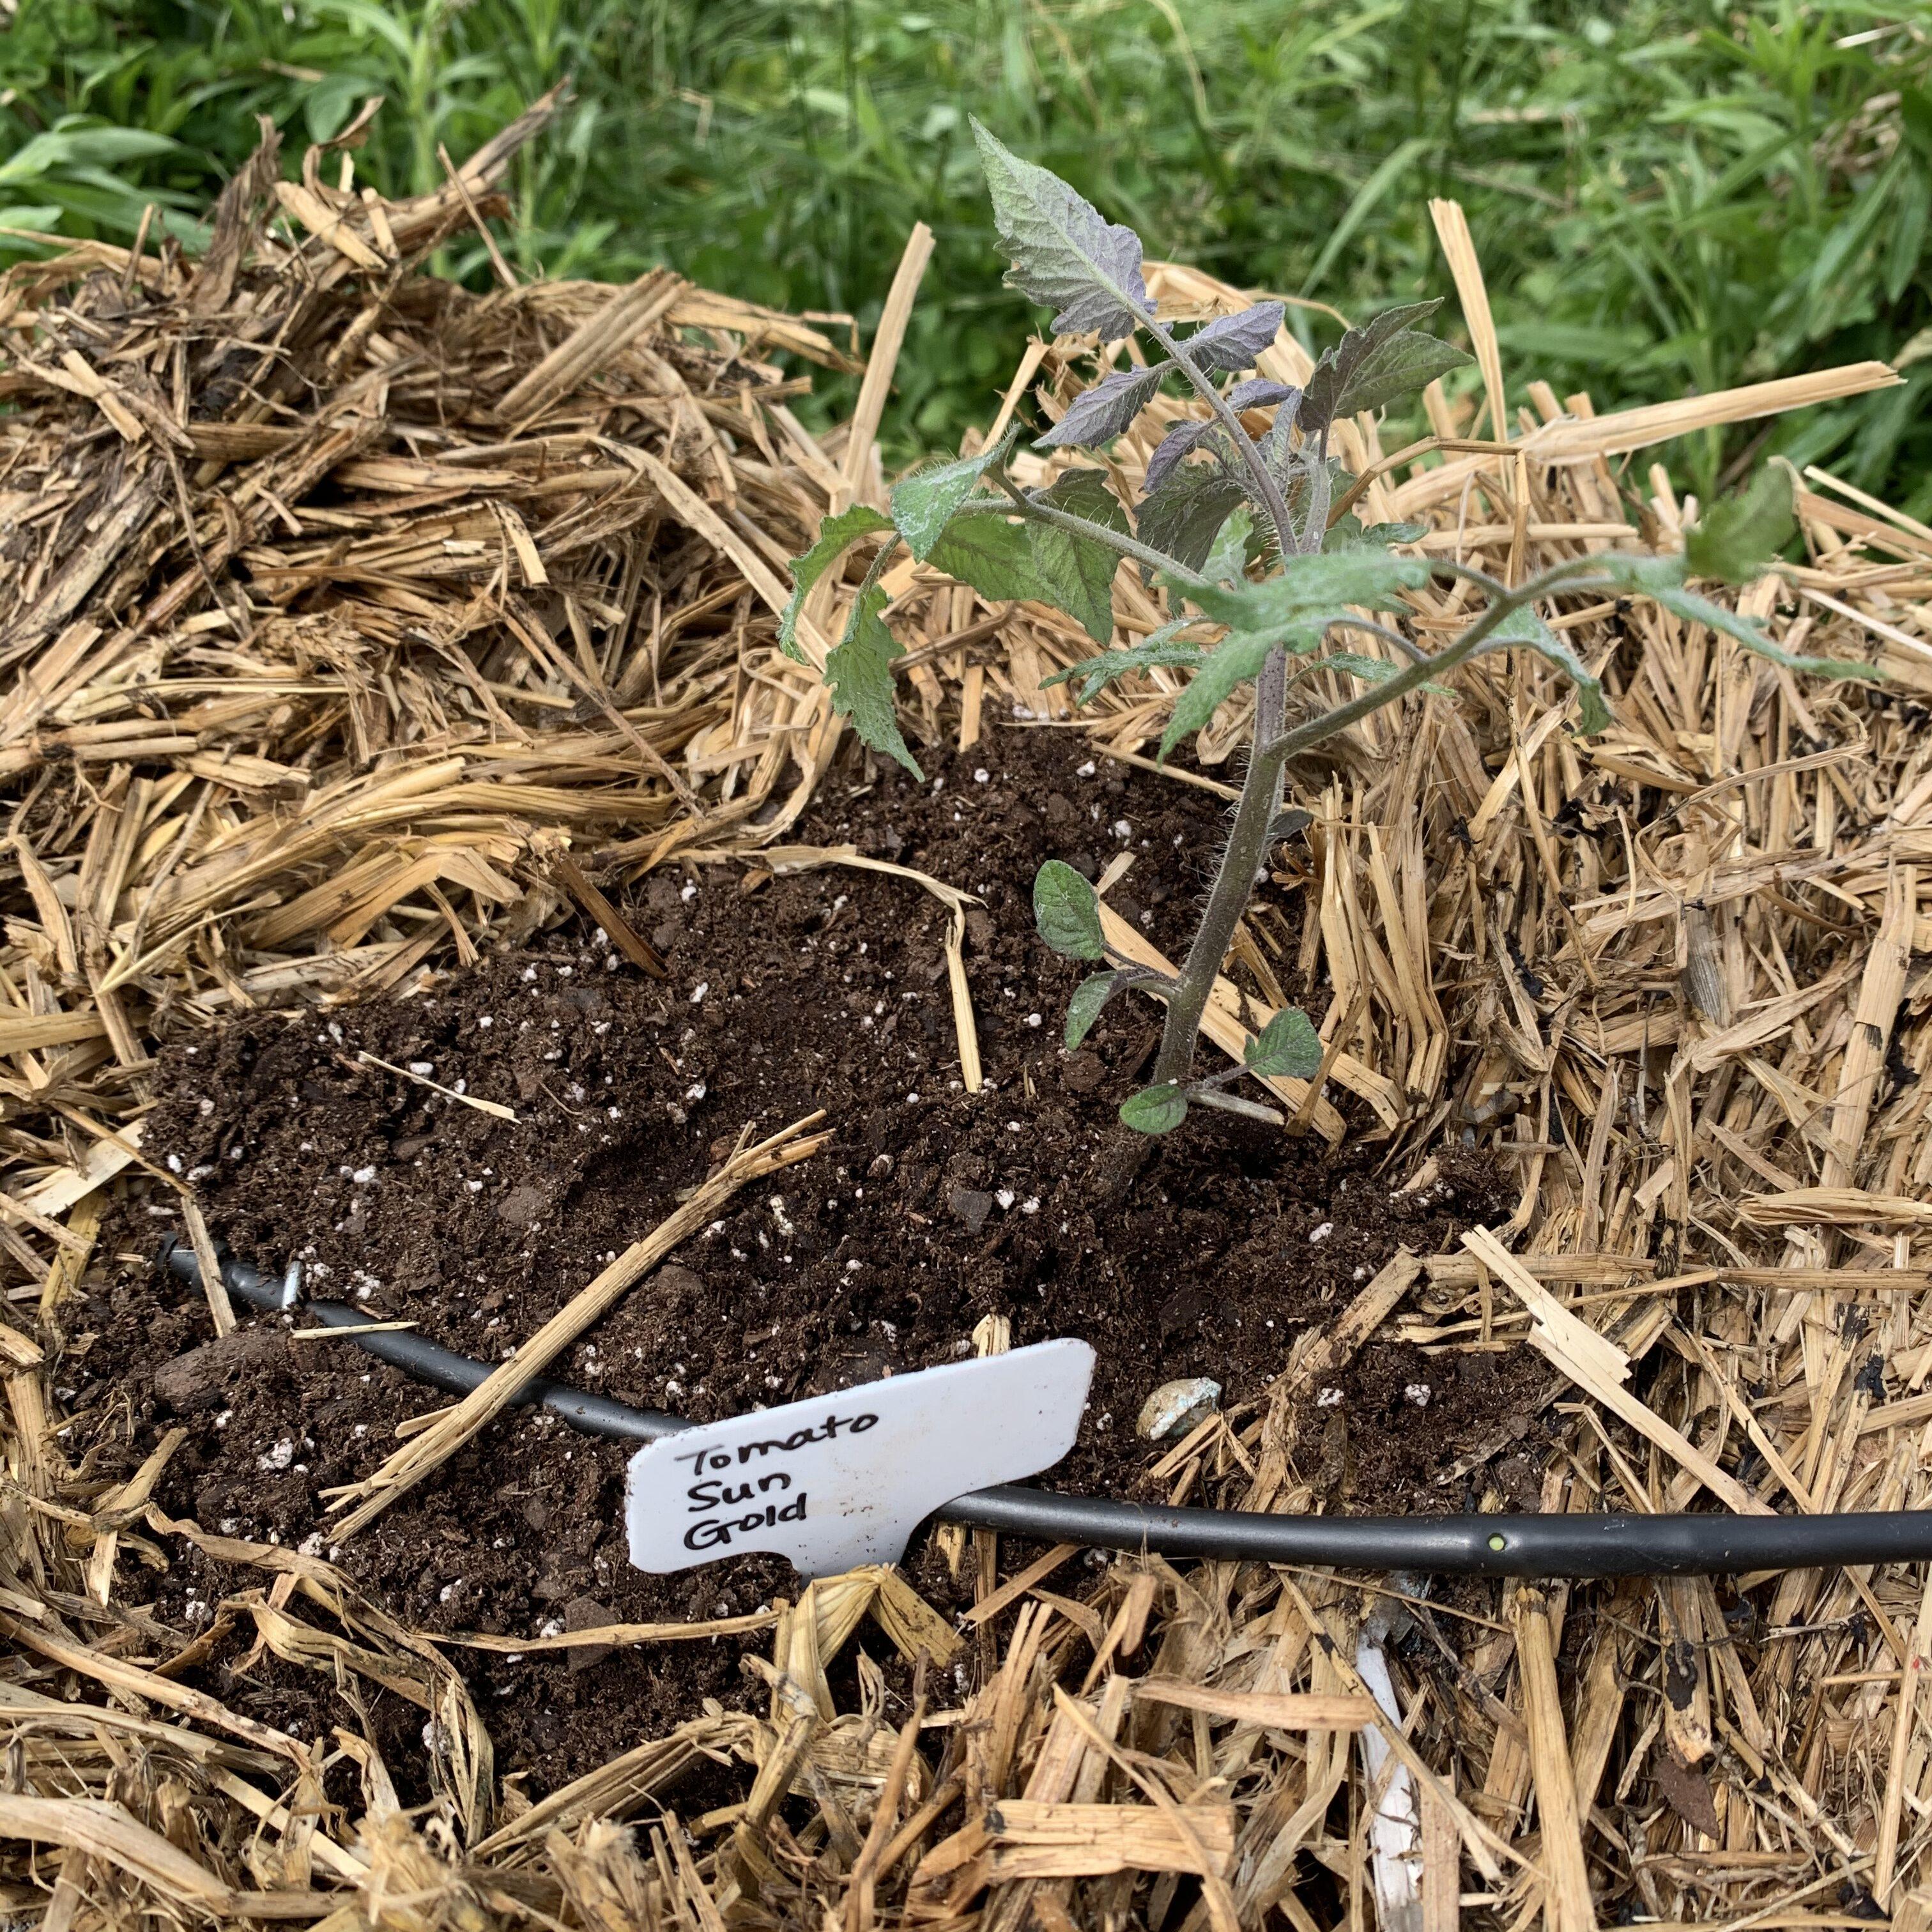 CC077BF9 56F3 46FD A1E0 67E799187BEC Tomato planting day!